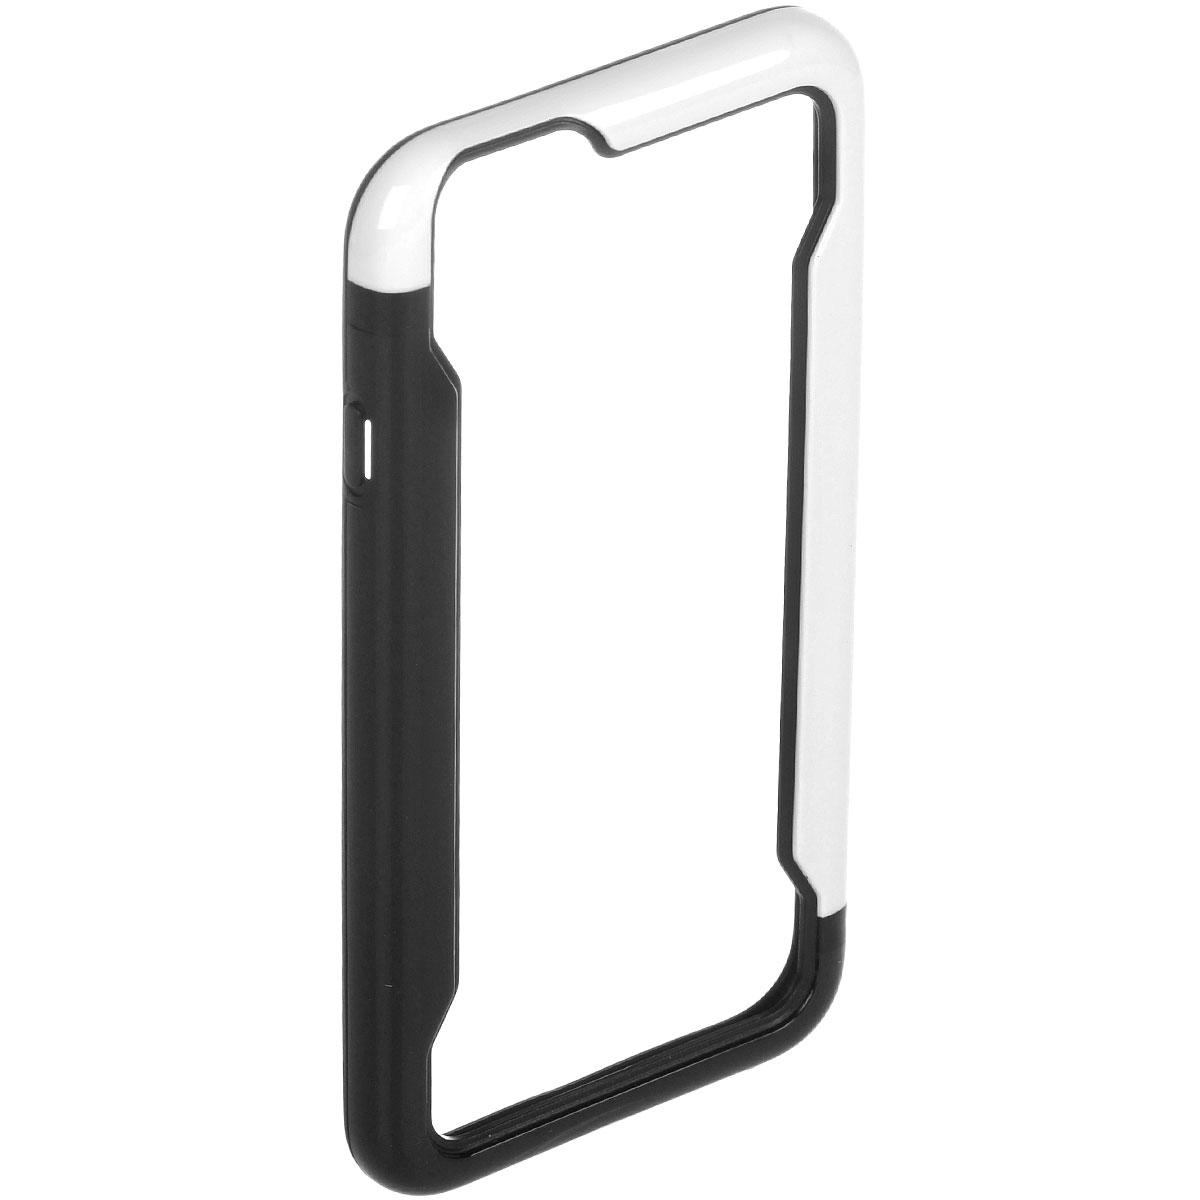 Liberty Project чехол-накладка для iPhone 6, Black White liberty project чехол флип для huawei ascend p7 black